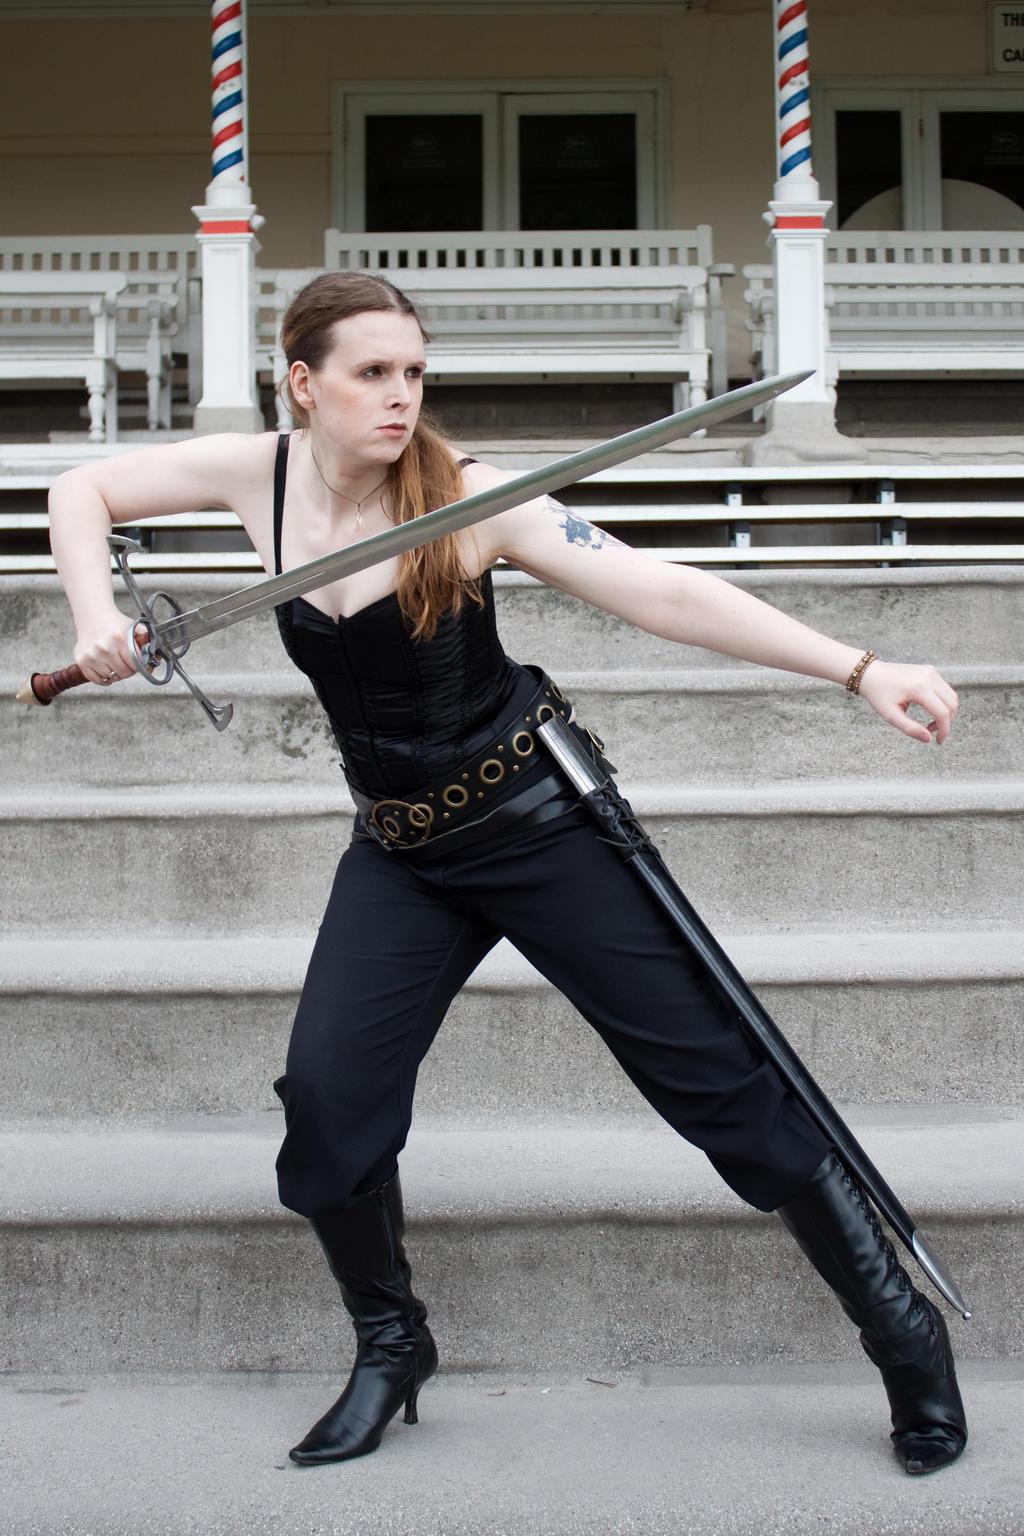 Sword pose stock 13 by Random-Acts-Stock on DeviantArt